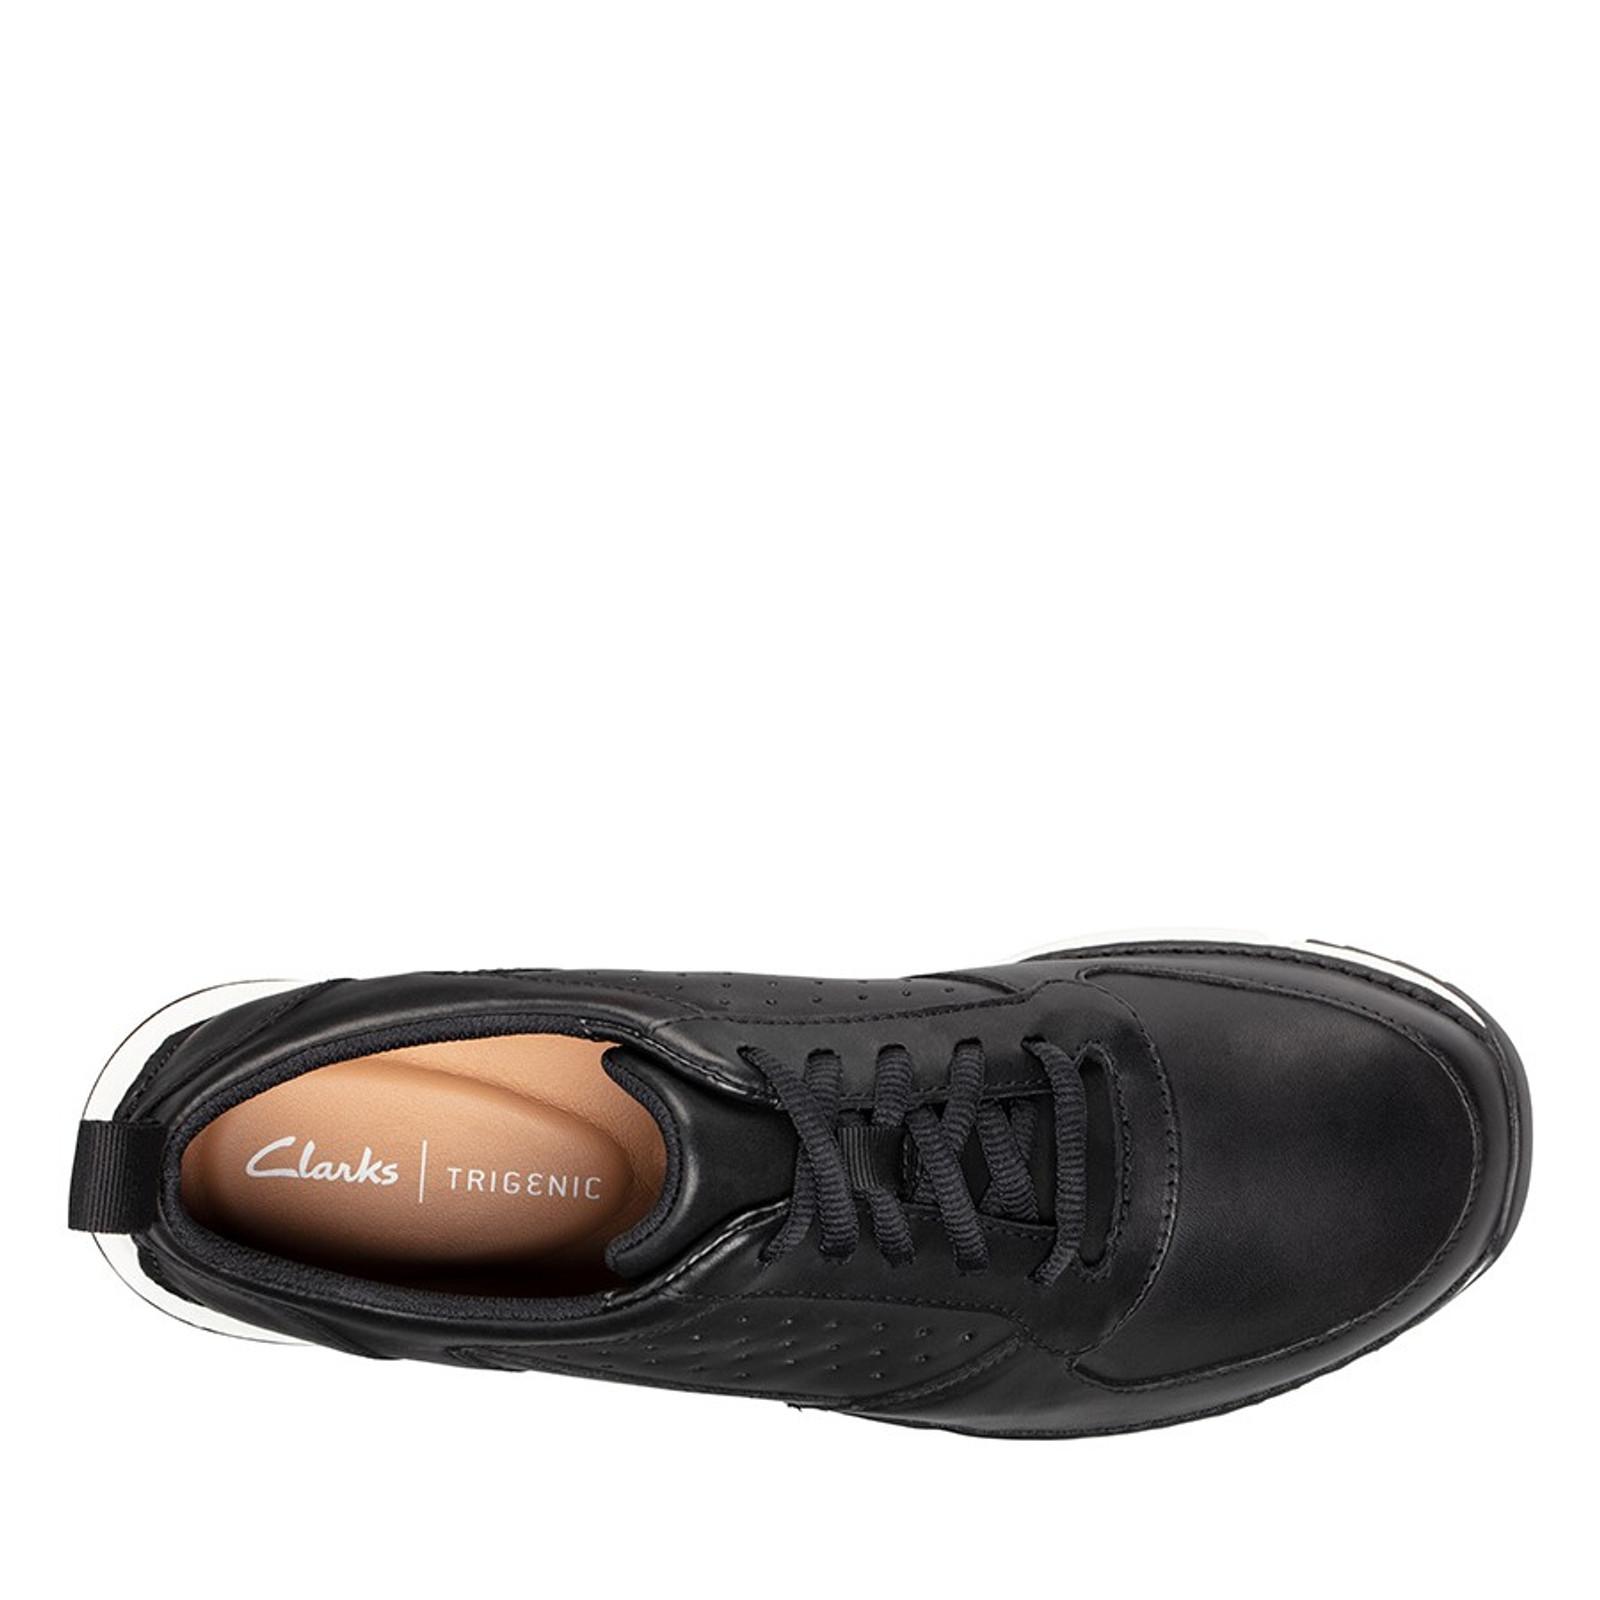 Clarks Mens TRI SPRINT Black Leather